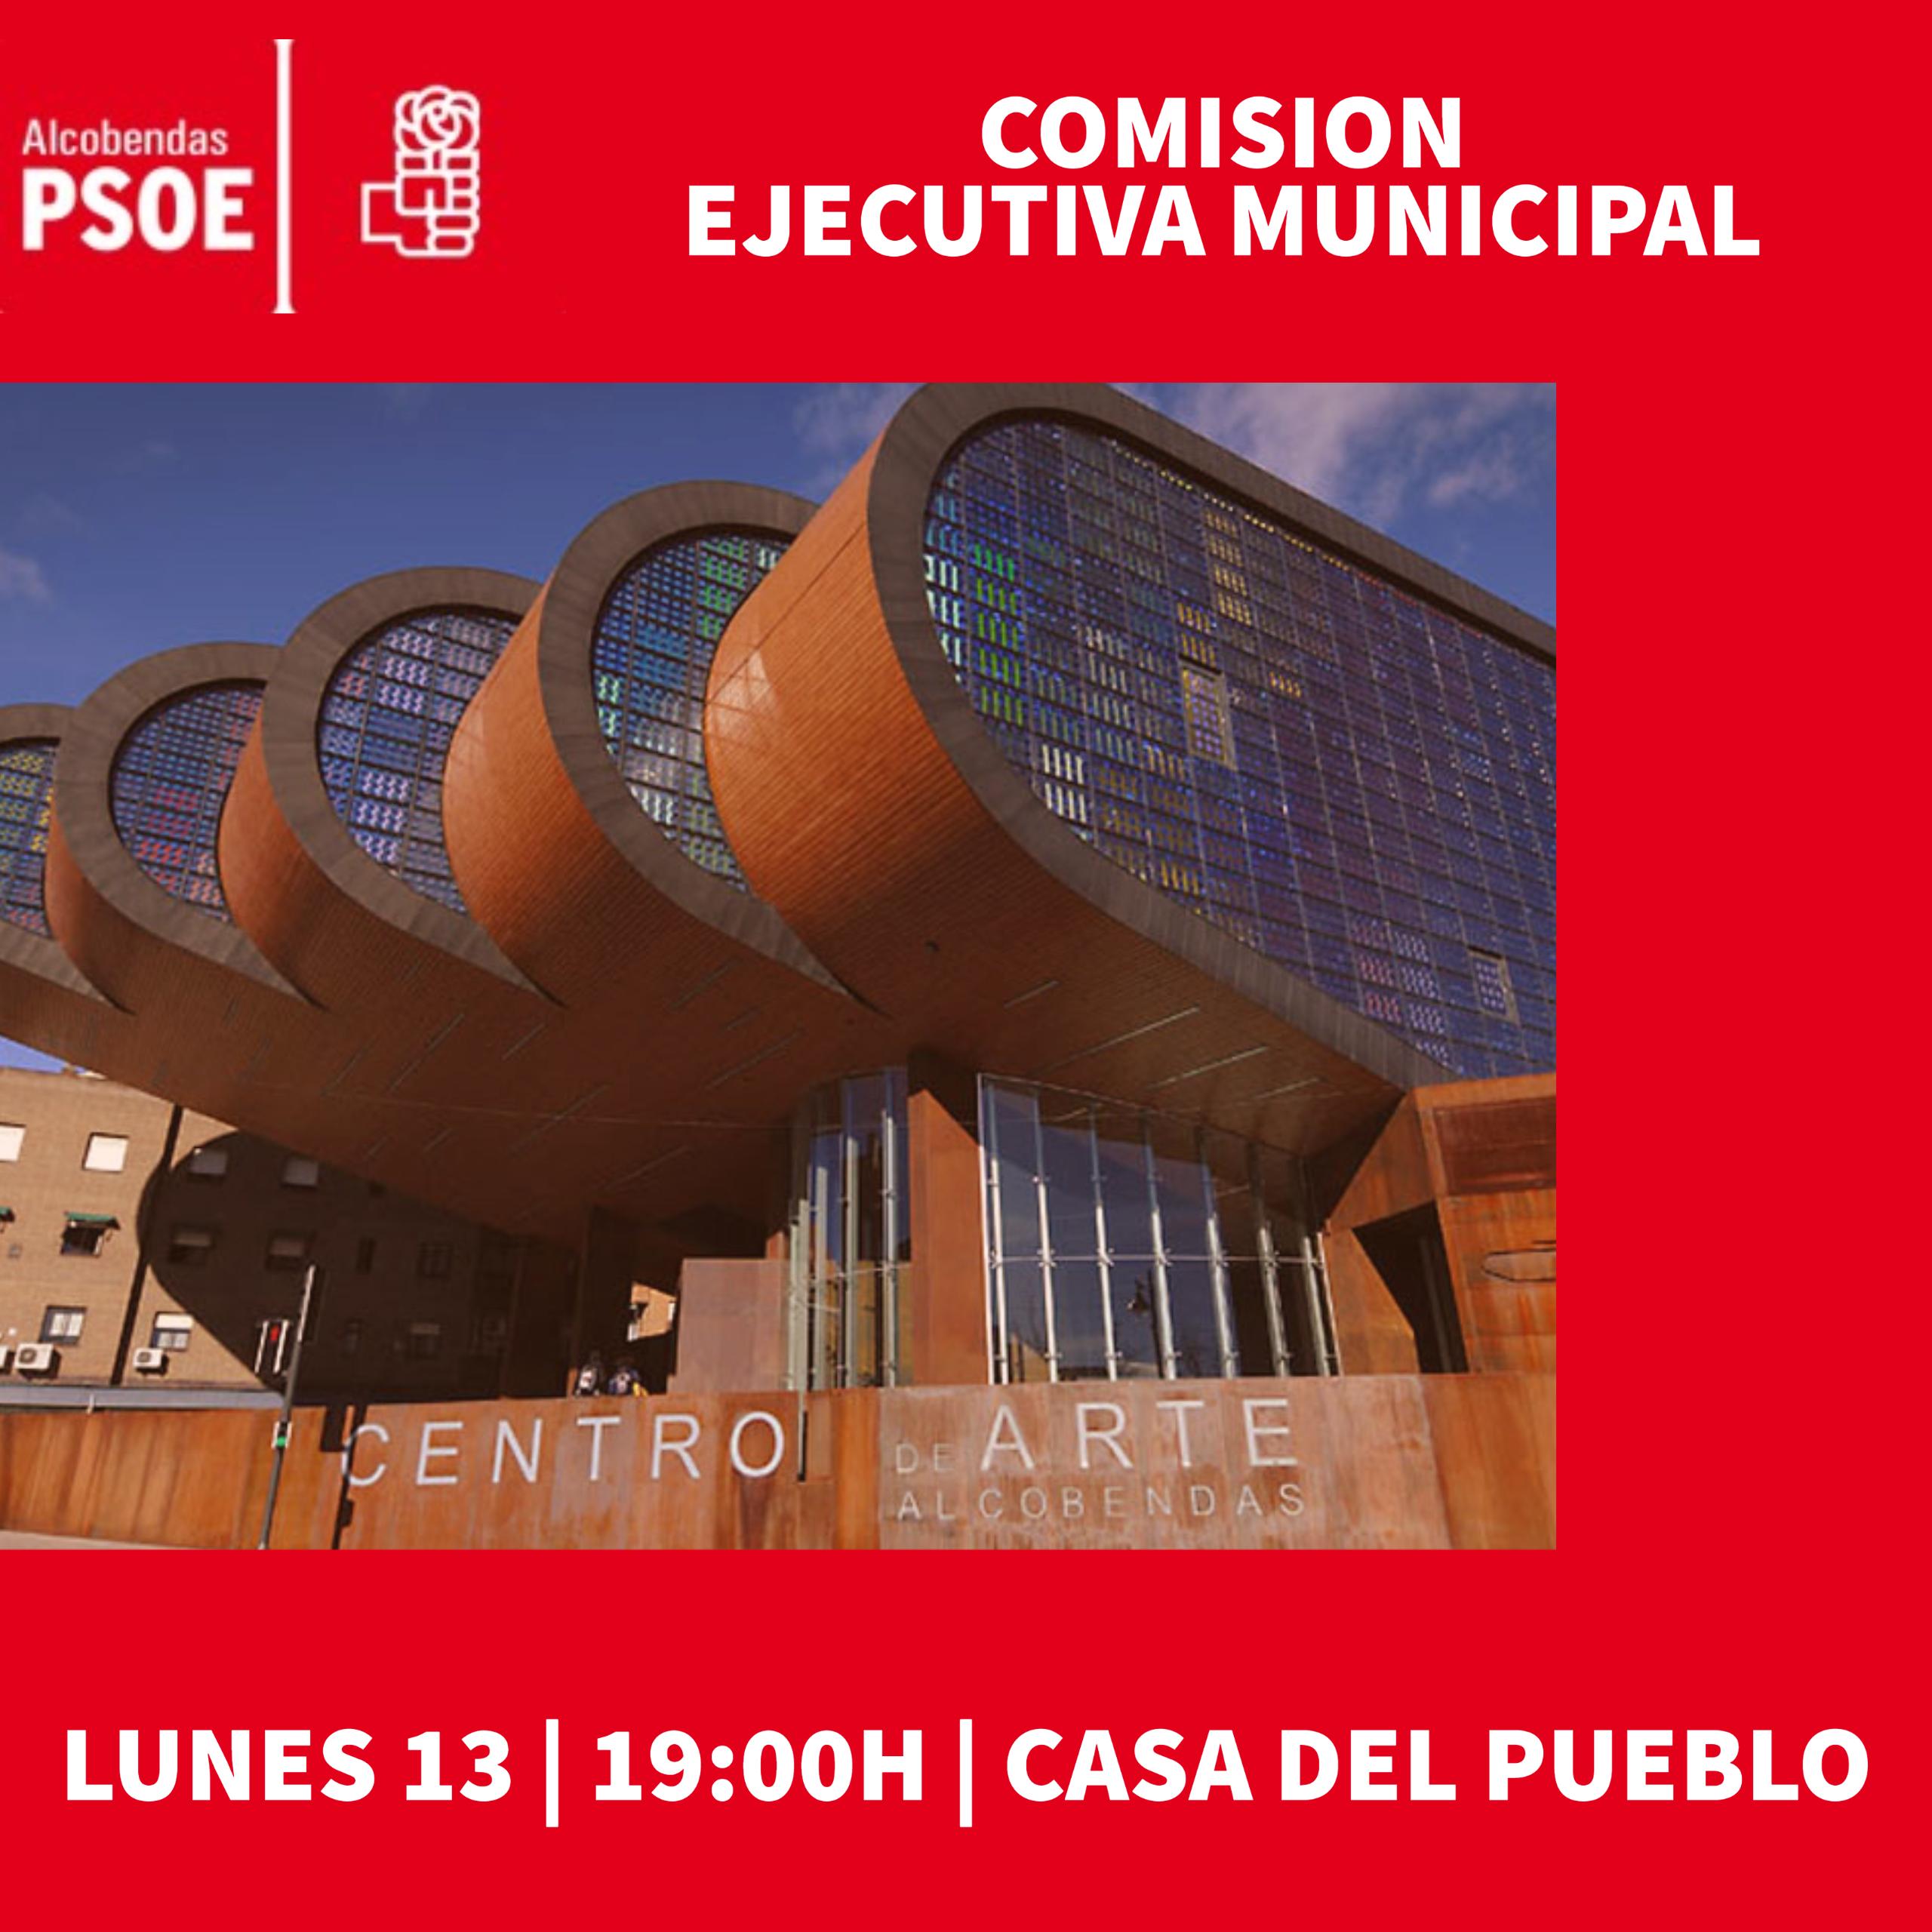 CEM PSOE ALCOBENDAS